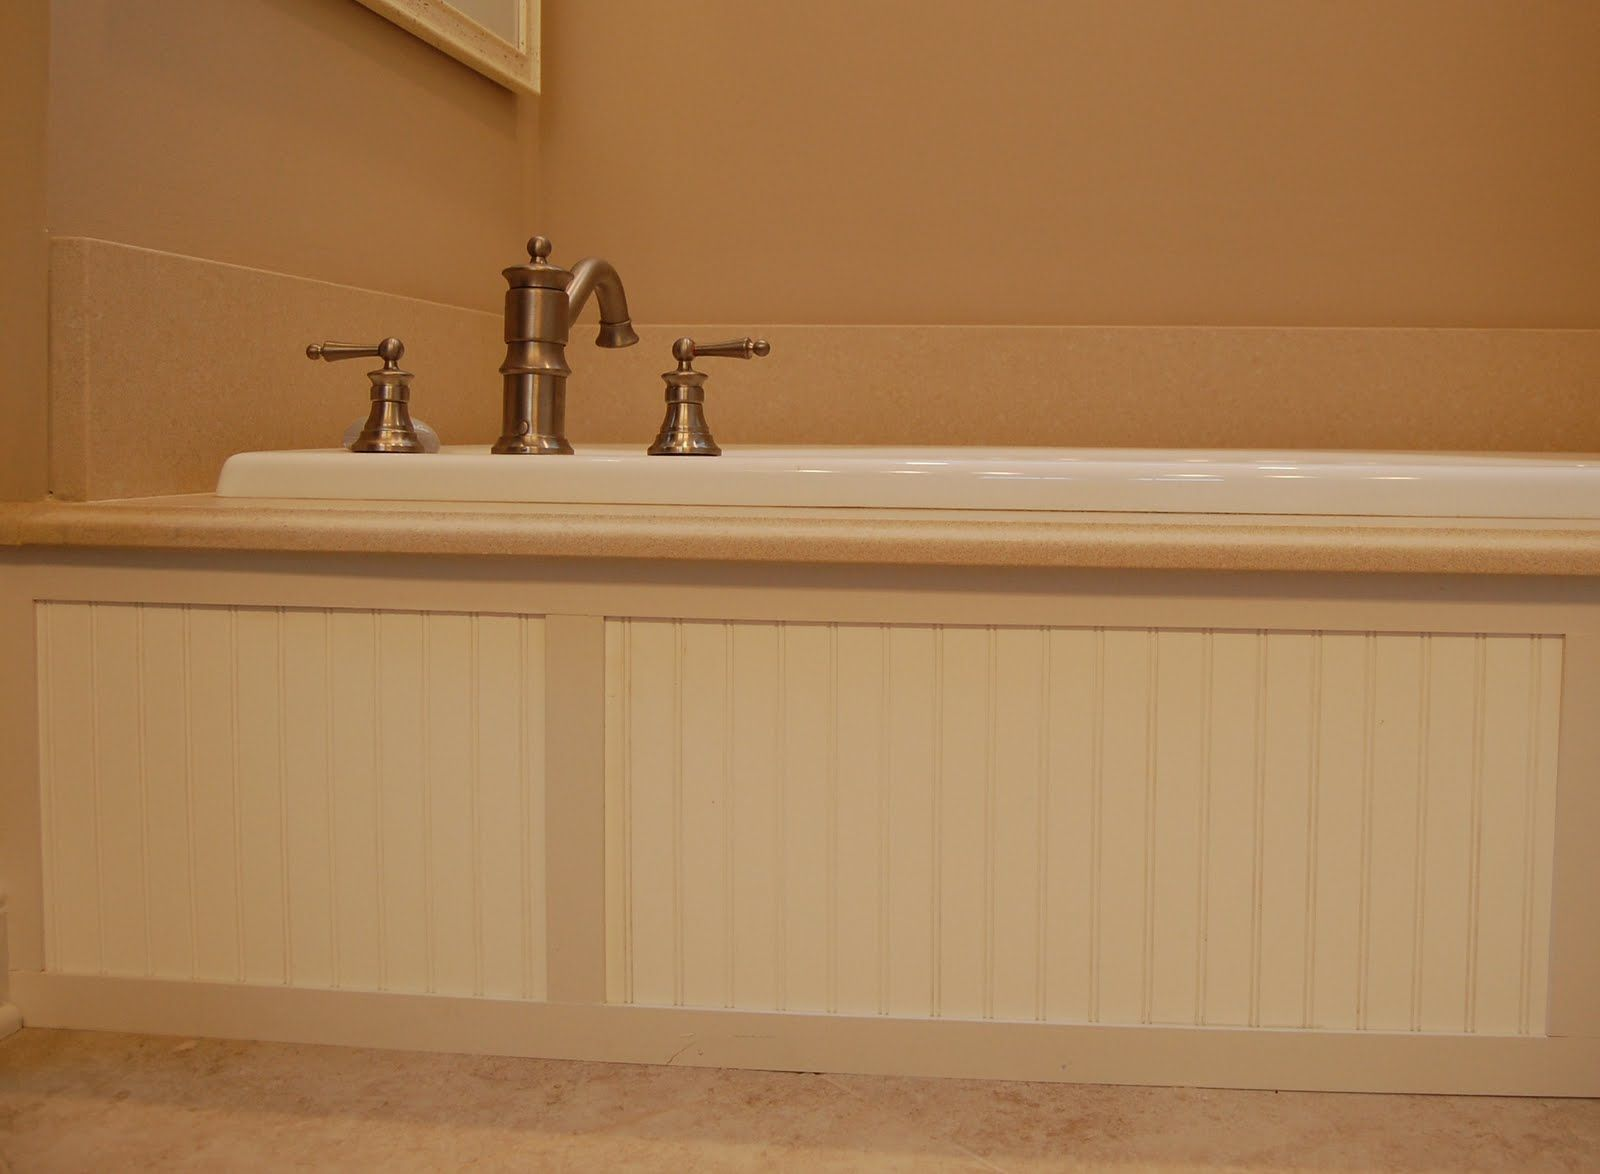 beadboard around tub | House stuff | Pinterest | Tubs, Semi gloss ...